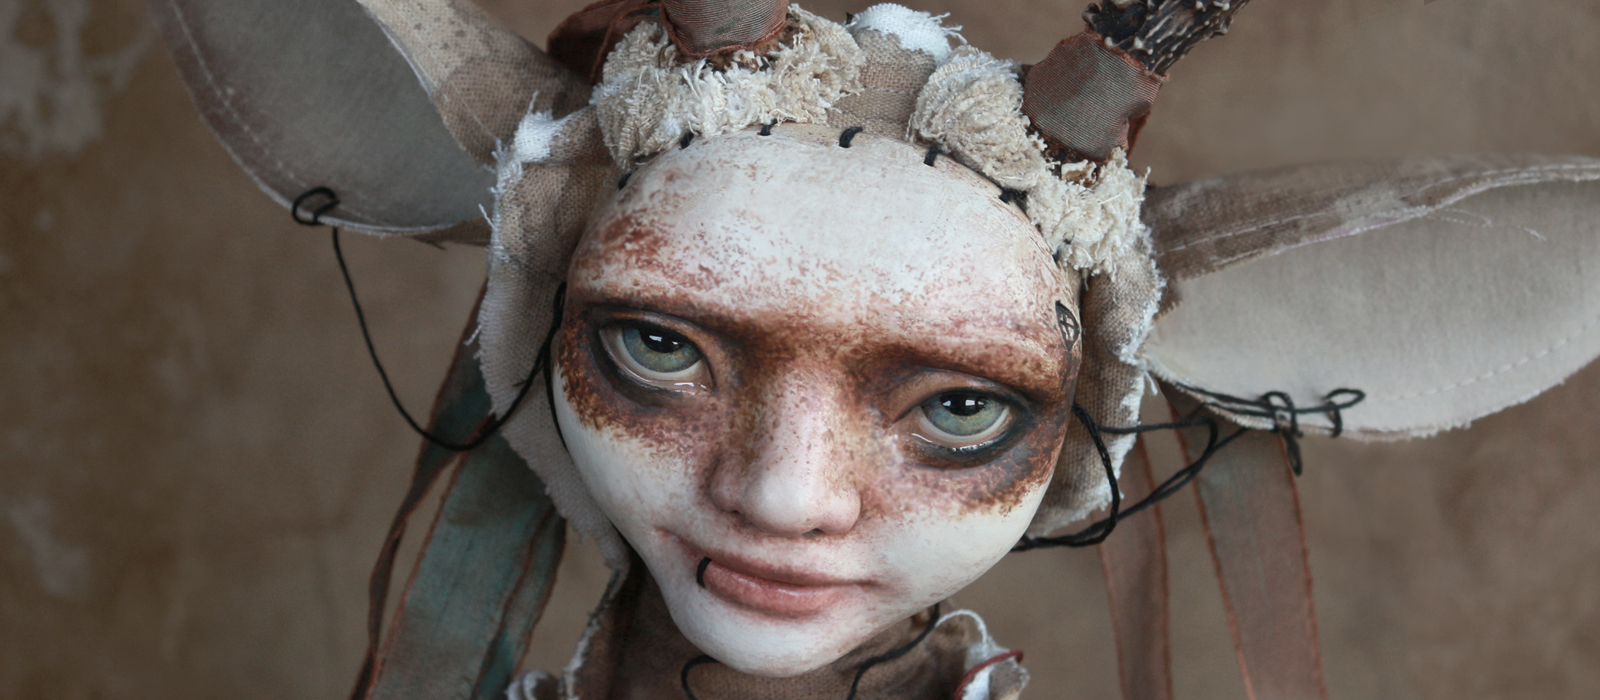 Lovia – phantasmagoric portrait doll